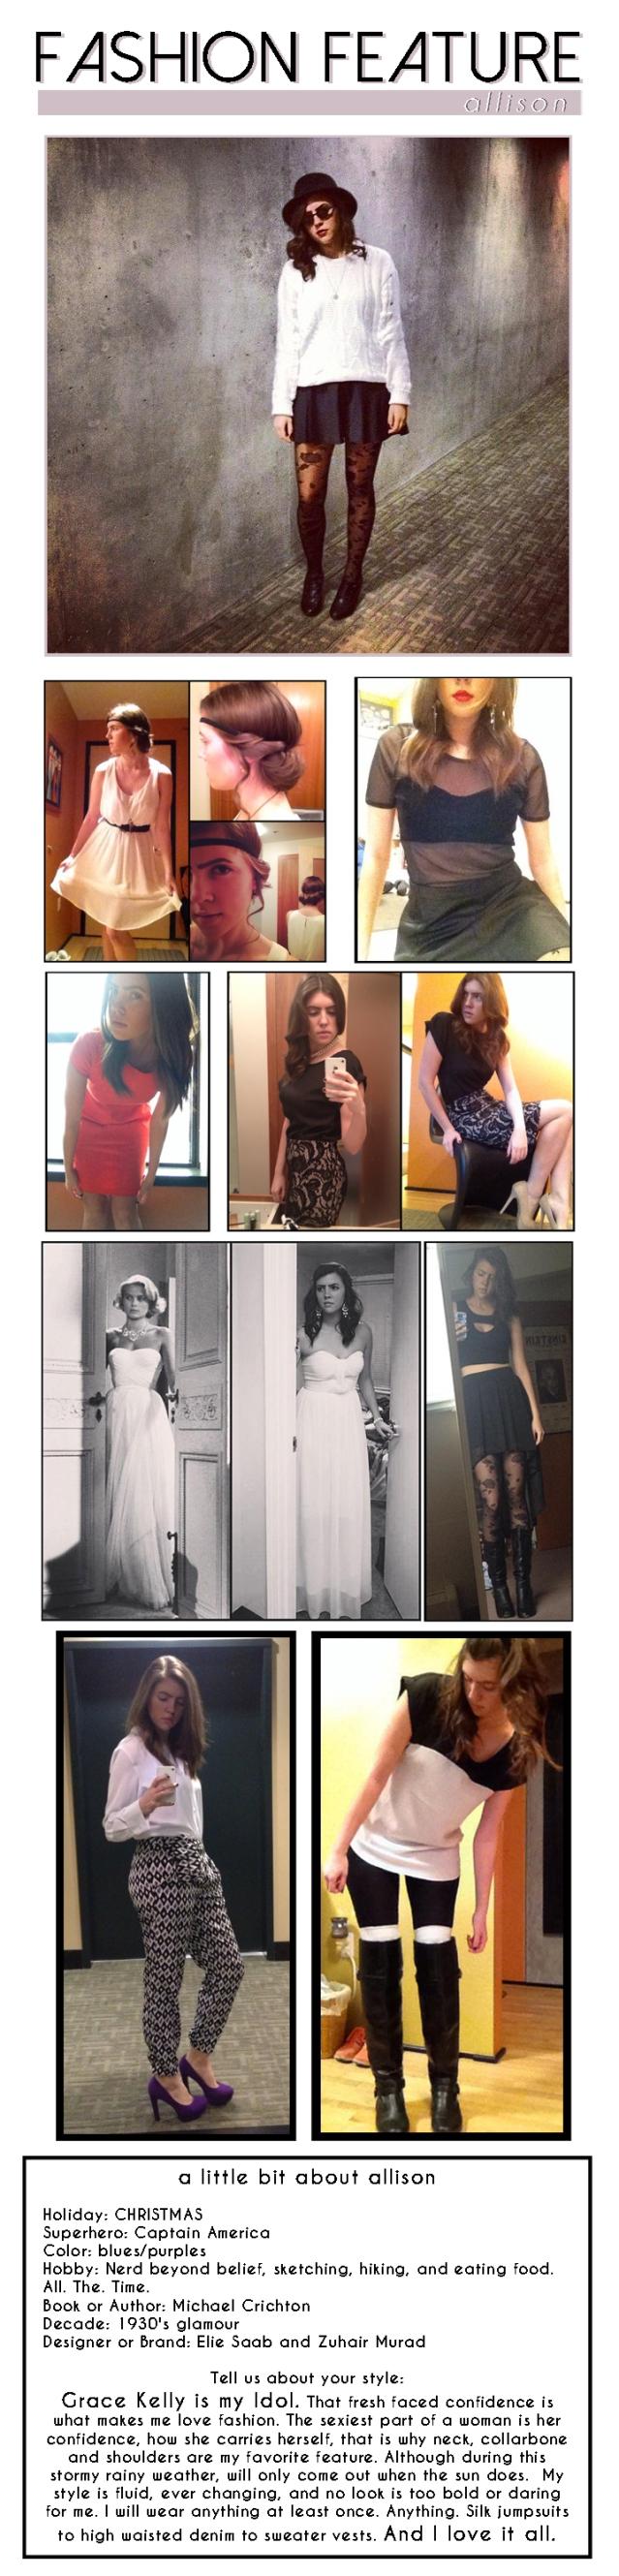 Fashion Feature - Allison